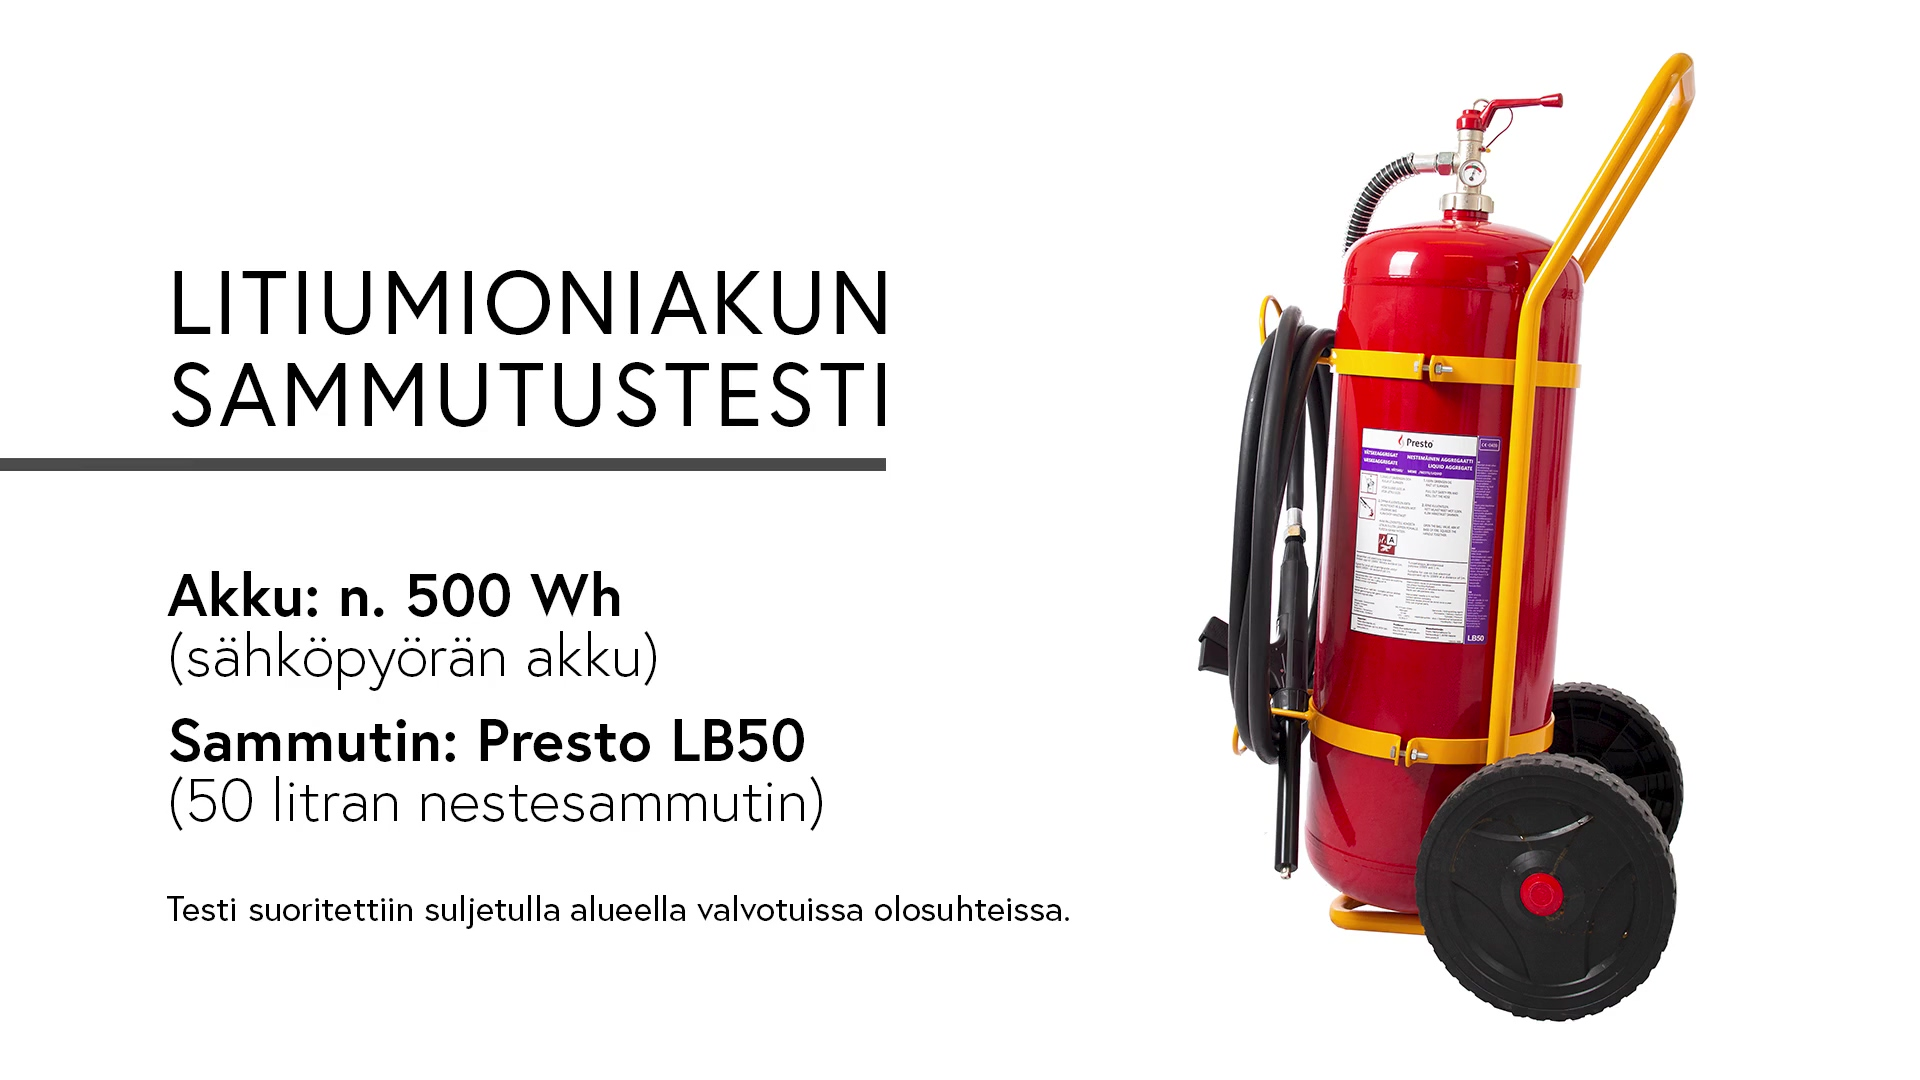 Presto_LB50_li-ioniakku_sammutus_040220